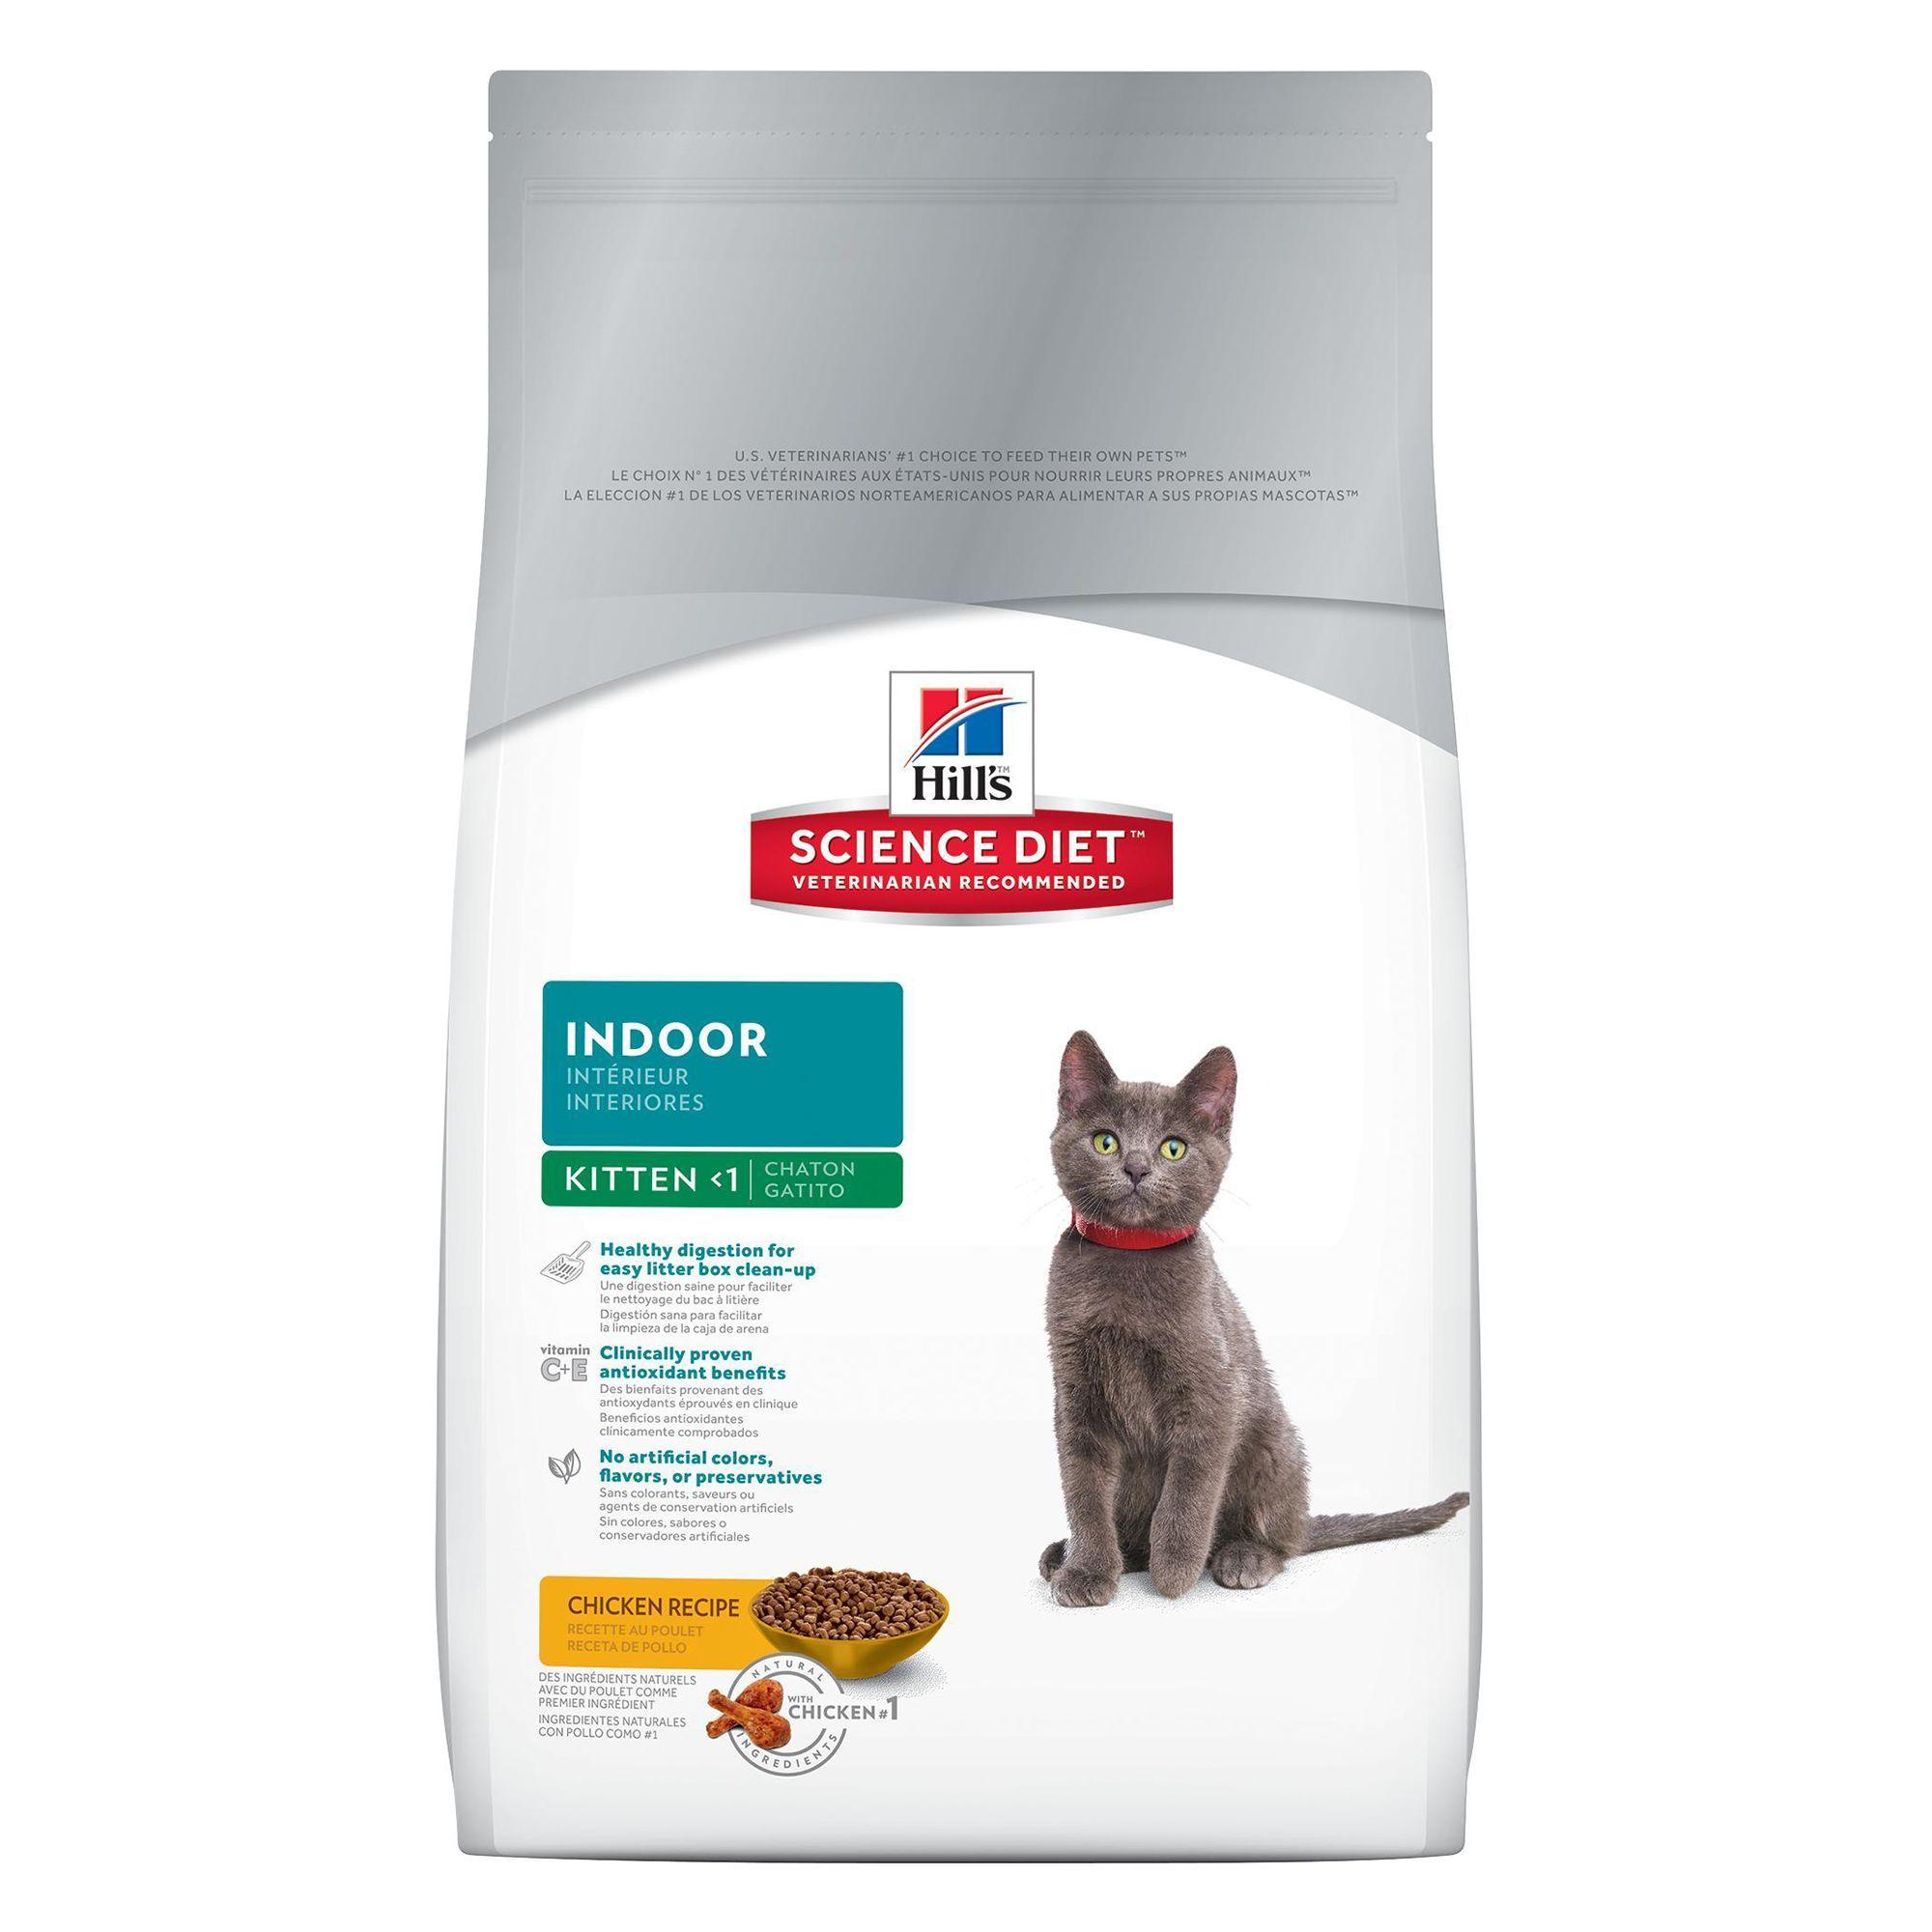 Hill's Science Diet Indoor Kitten Food Chicken size 3.5